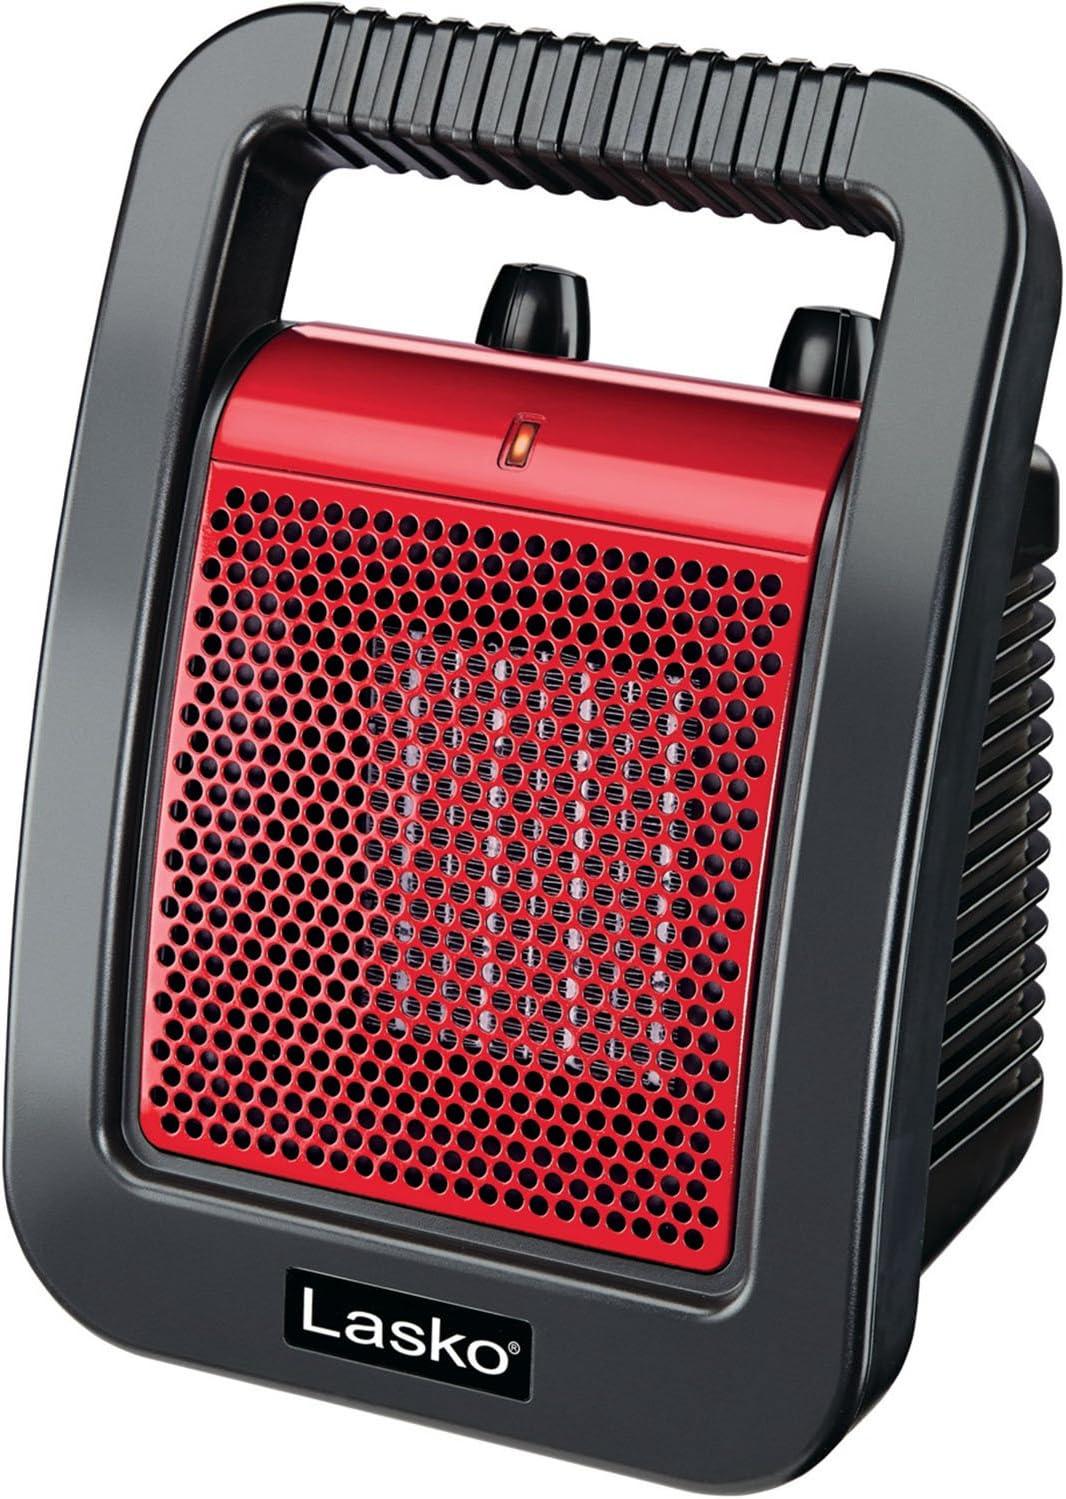 Lasko Ceramic Utility Heater with Adjustable Thermostat, Red CU12110